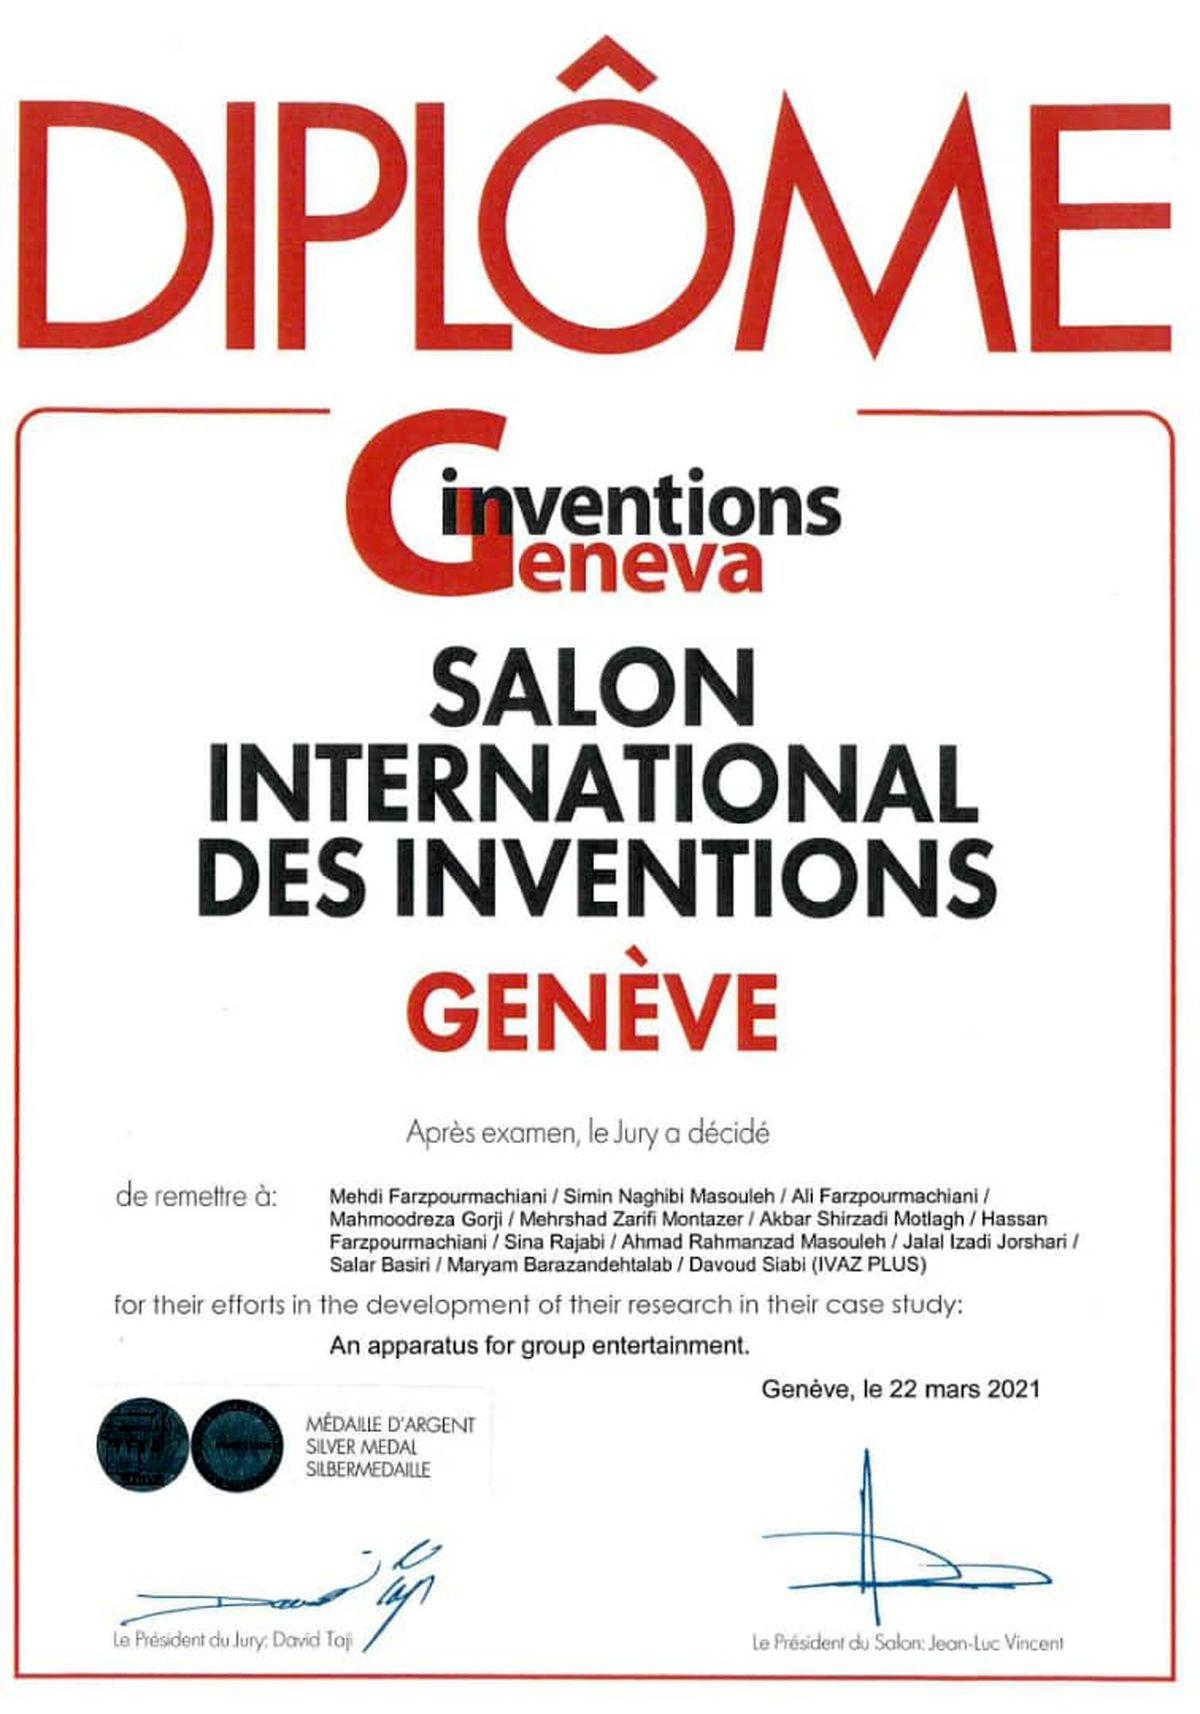 کسب مدال نقره جشنواره اختراعات ژنو سوئیس